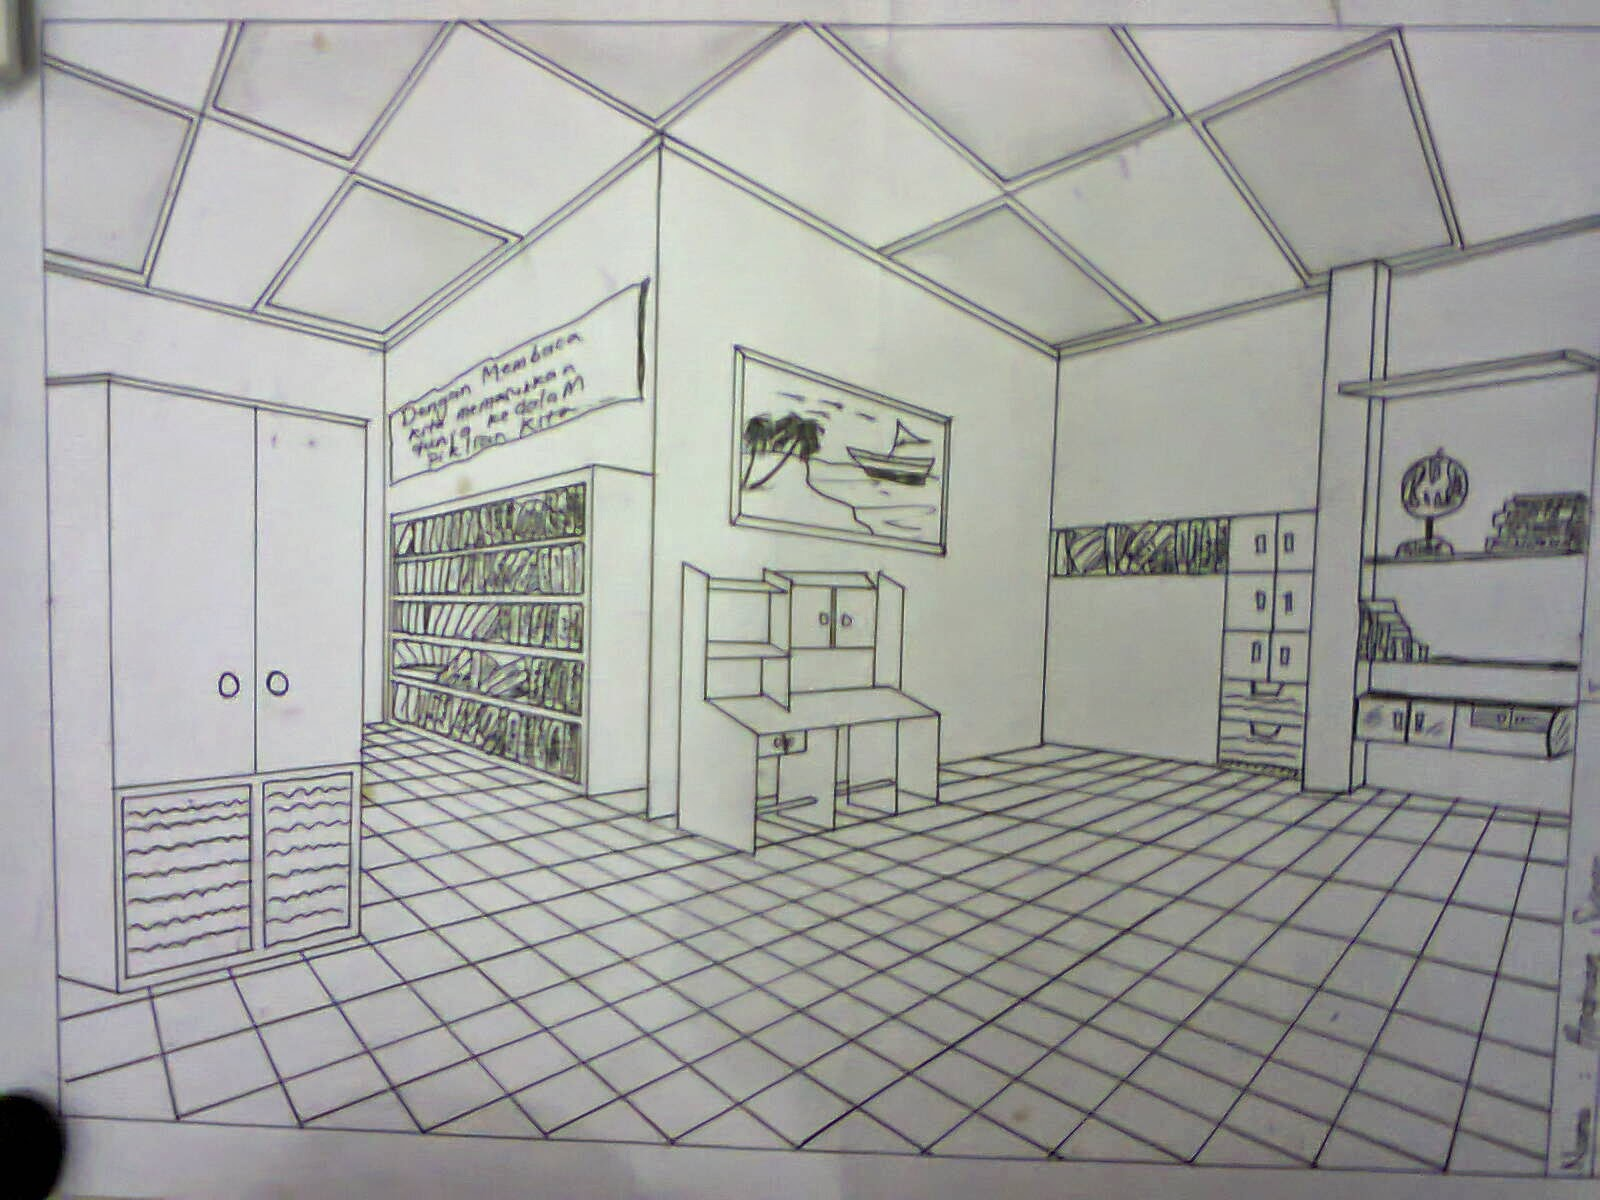 Andrian Suseno Gambar Perspektif 2 Titik Hilang Indoor Dalam Ruangan